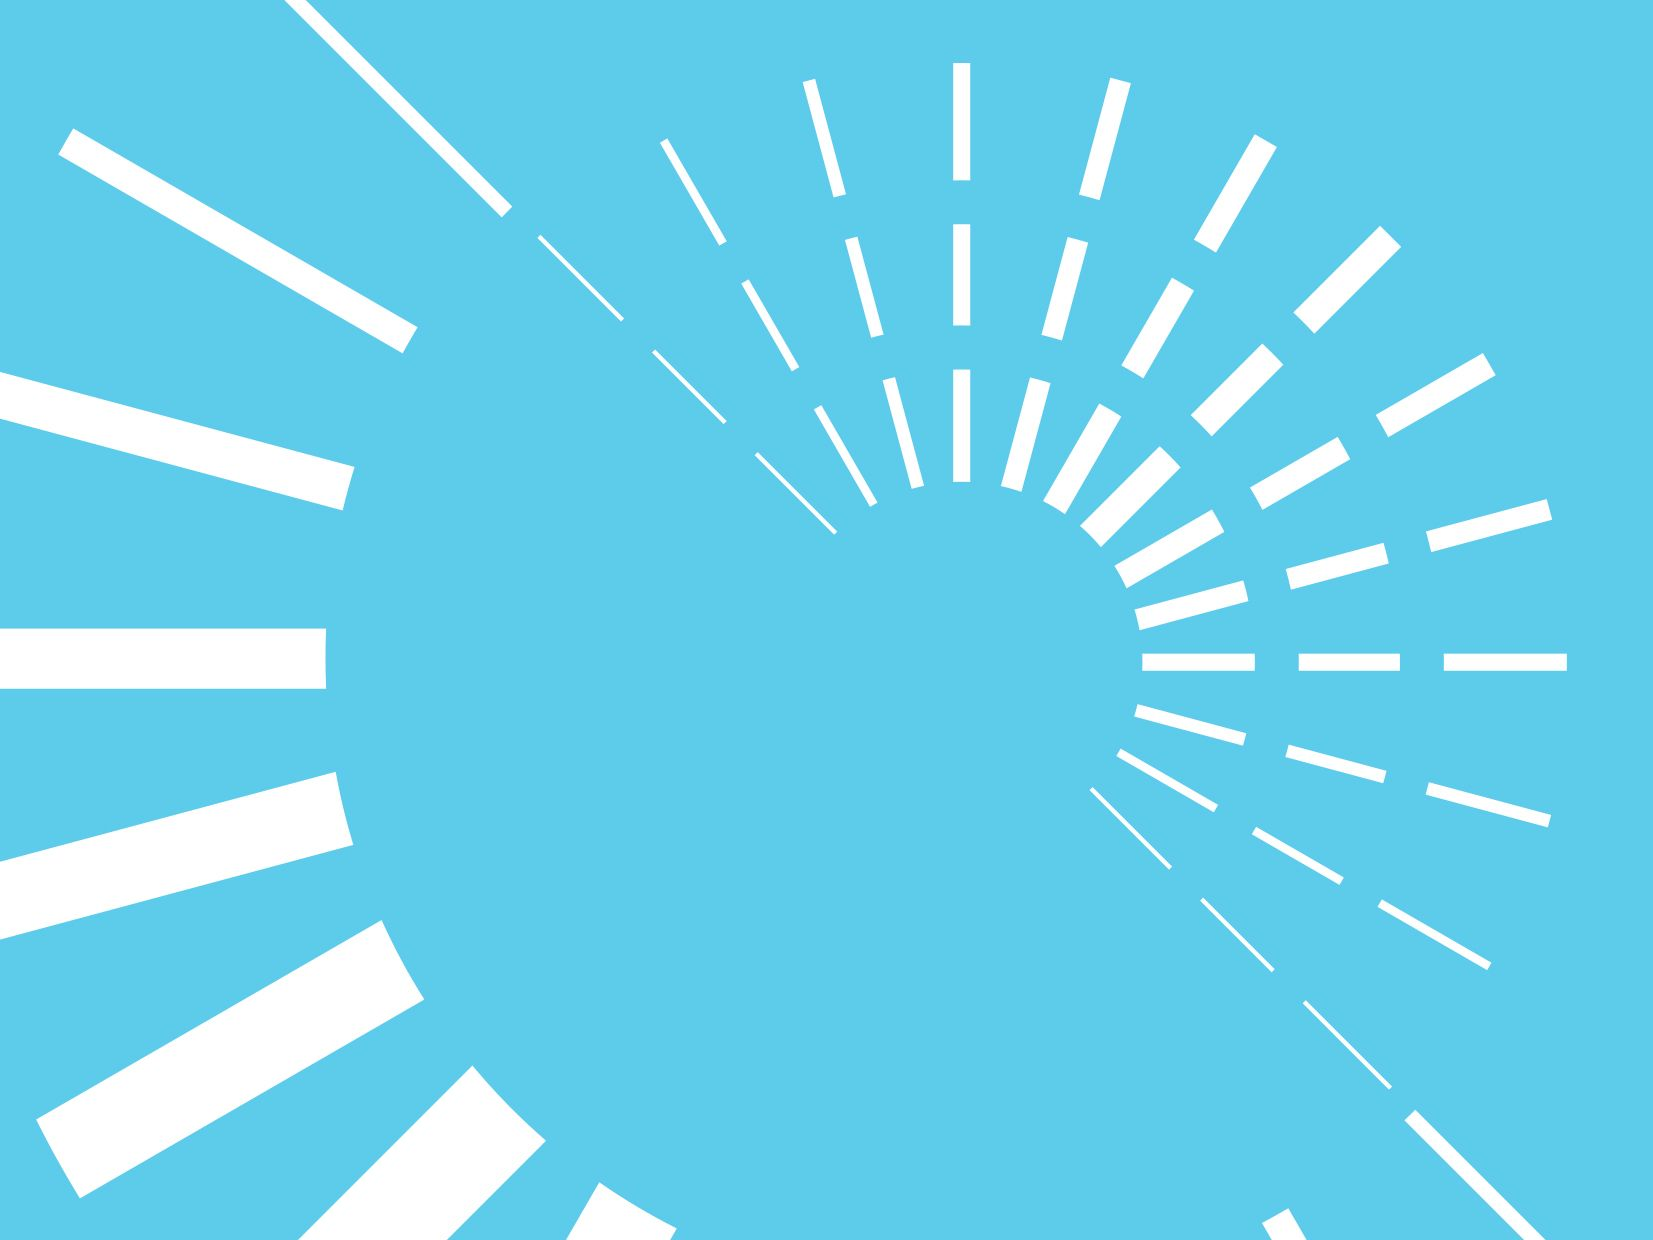 Decorative image of dashed white circles on blue background